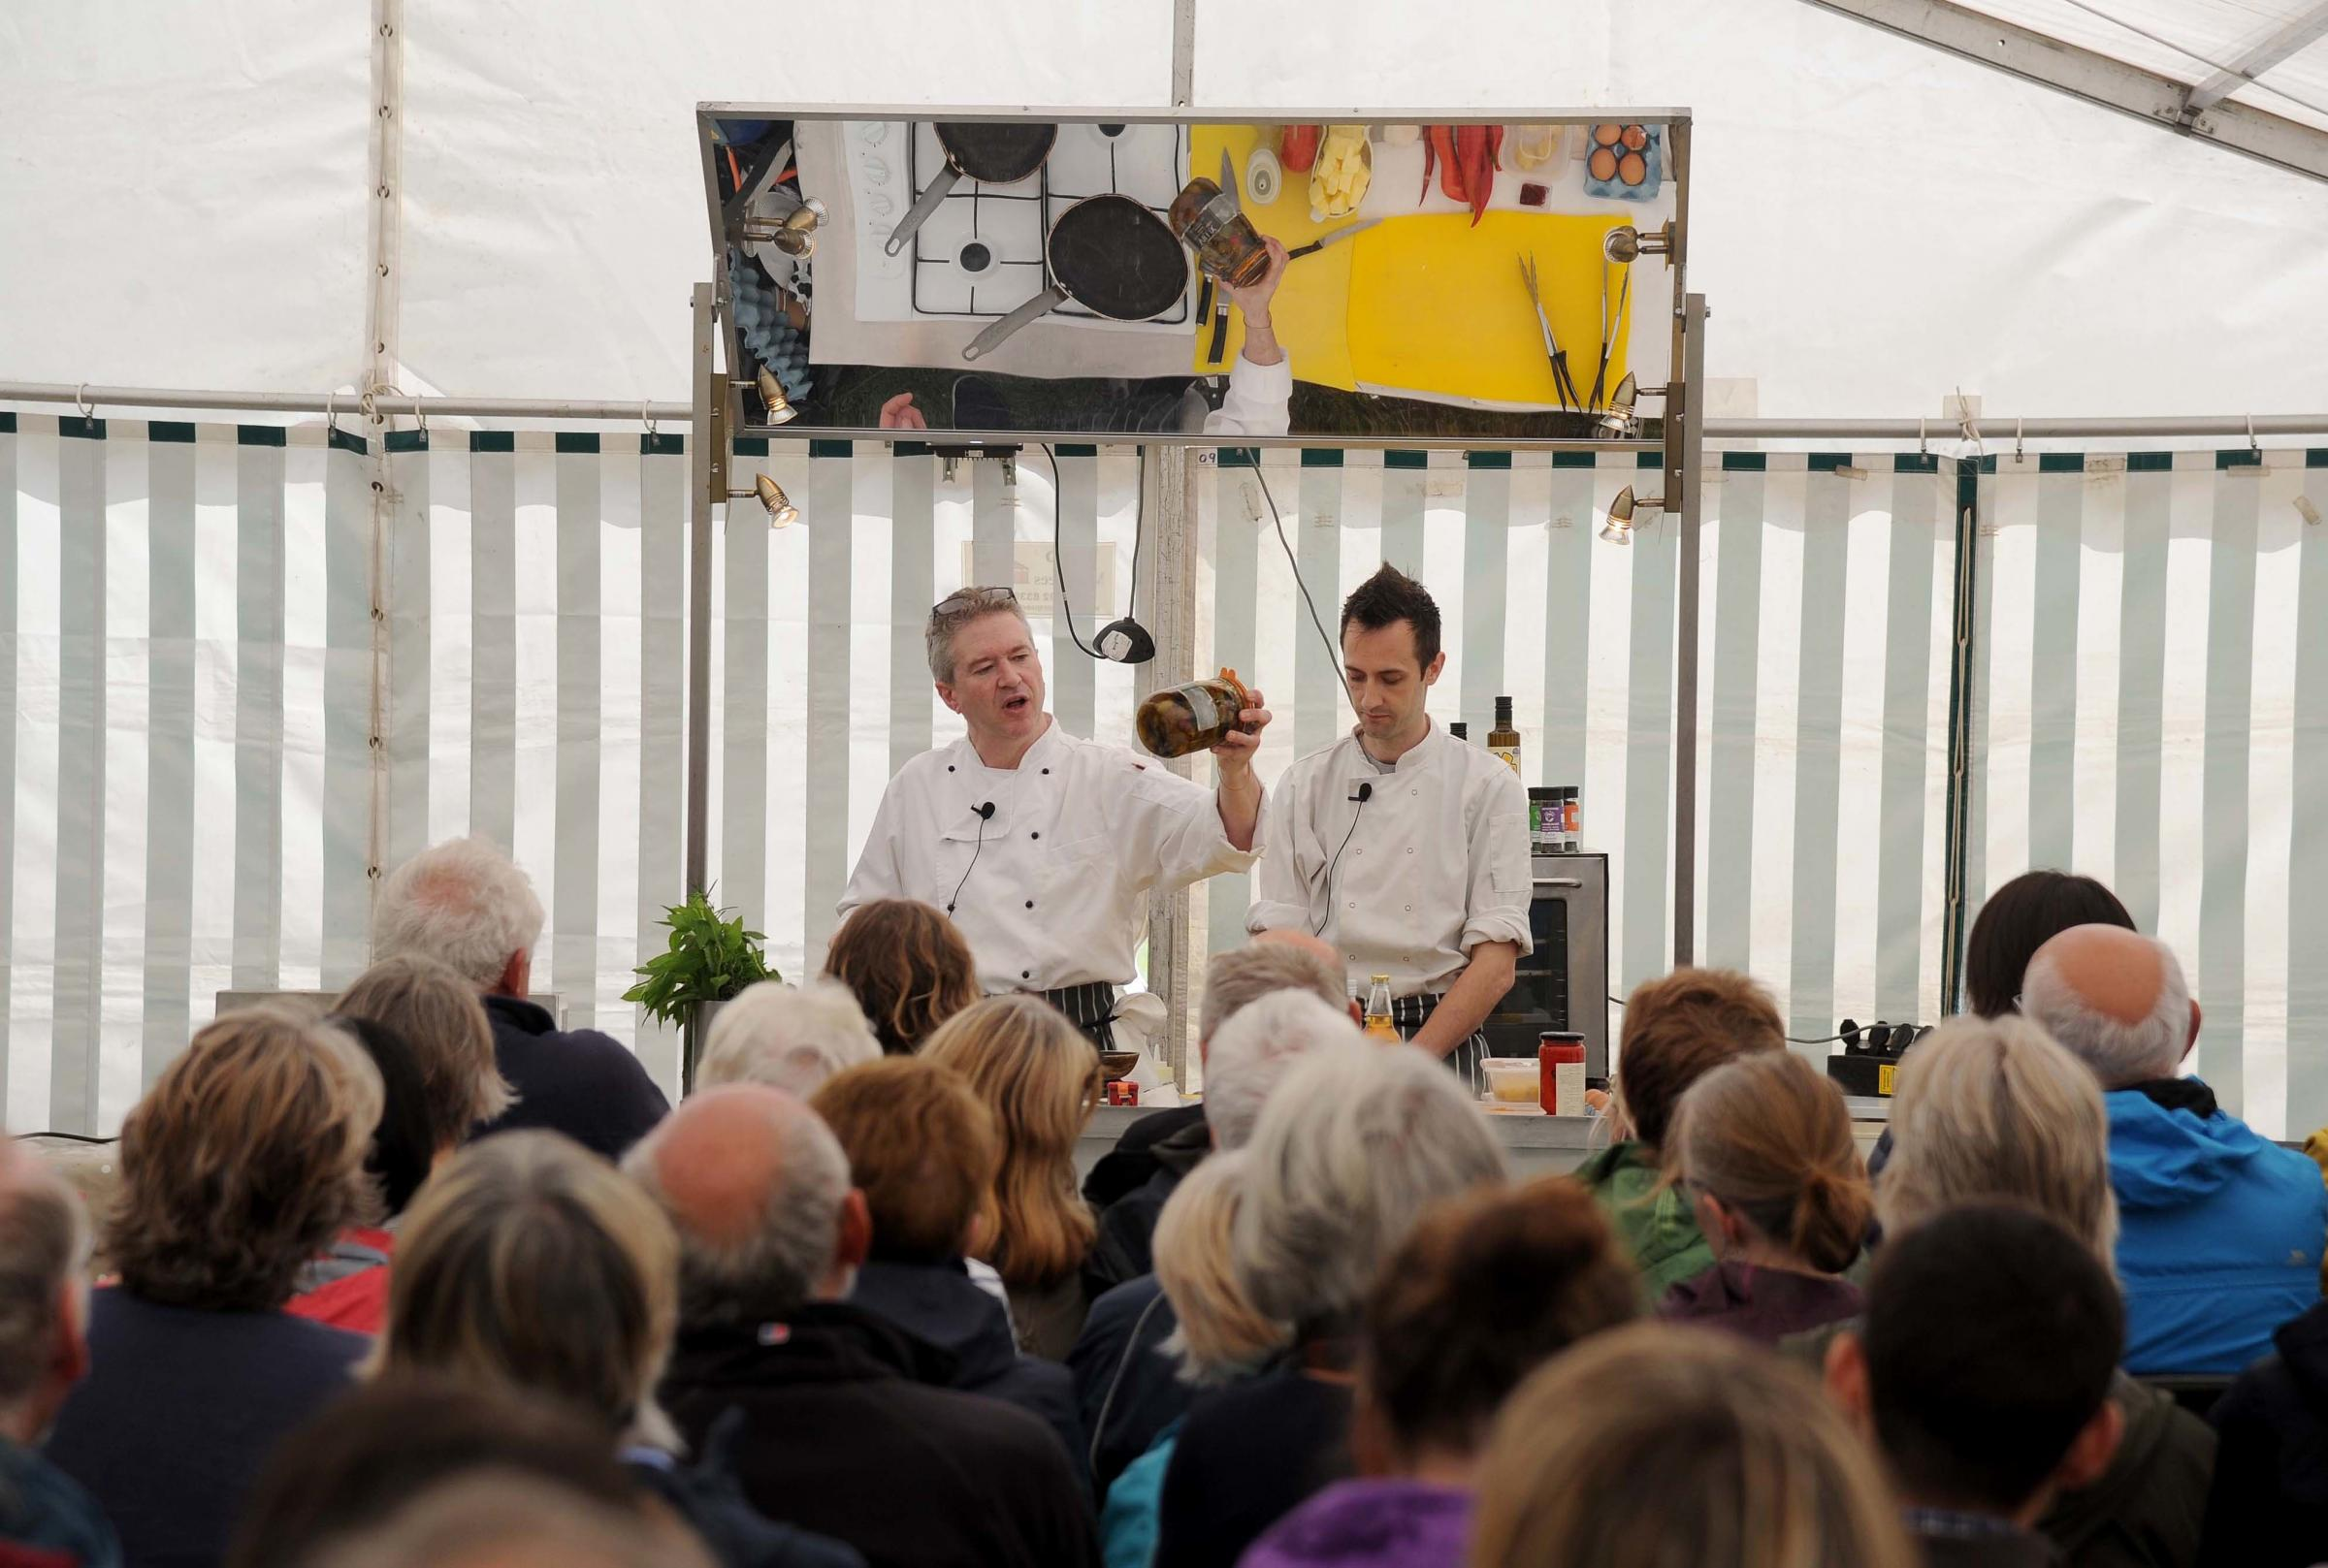 Popular Bridport Food Festival is again a great success